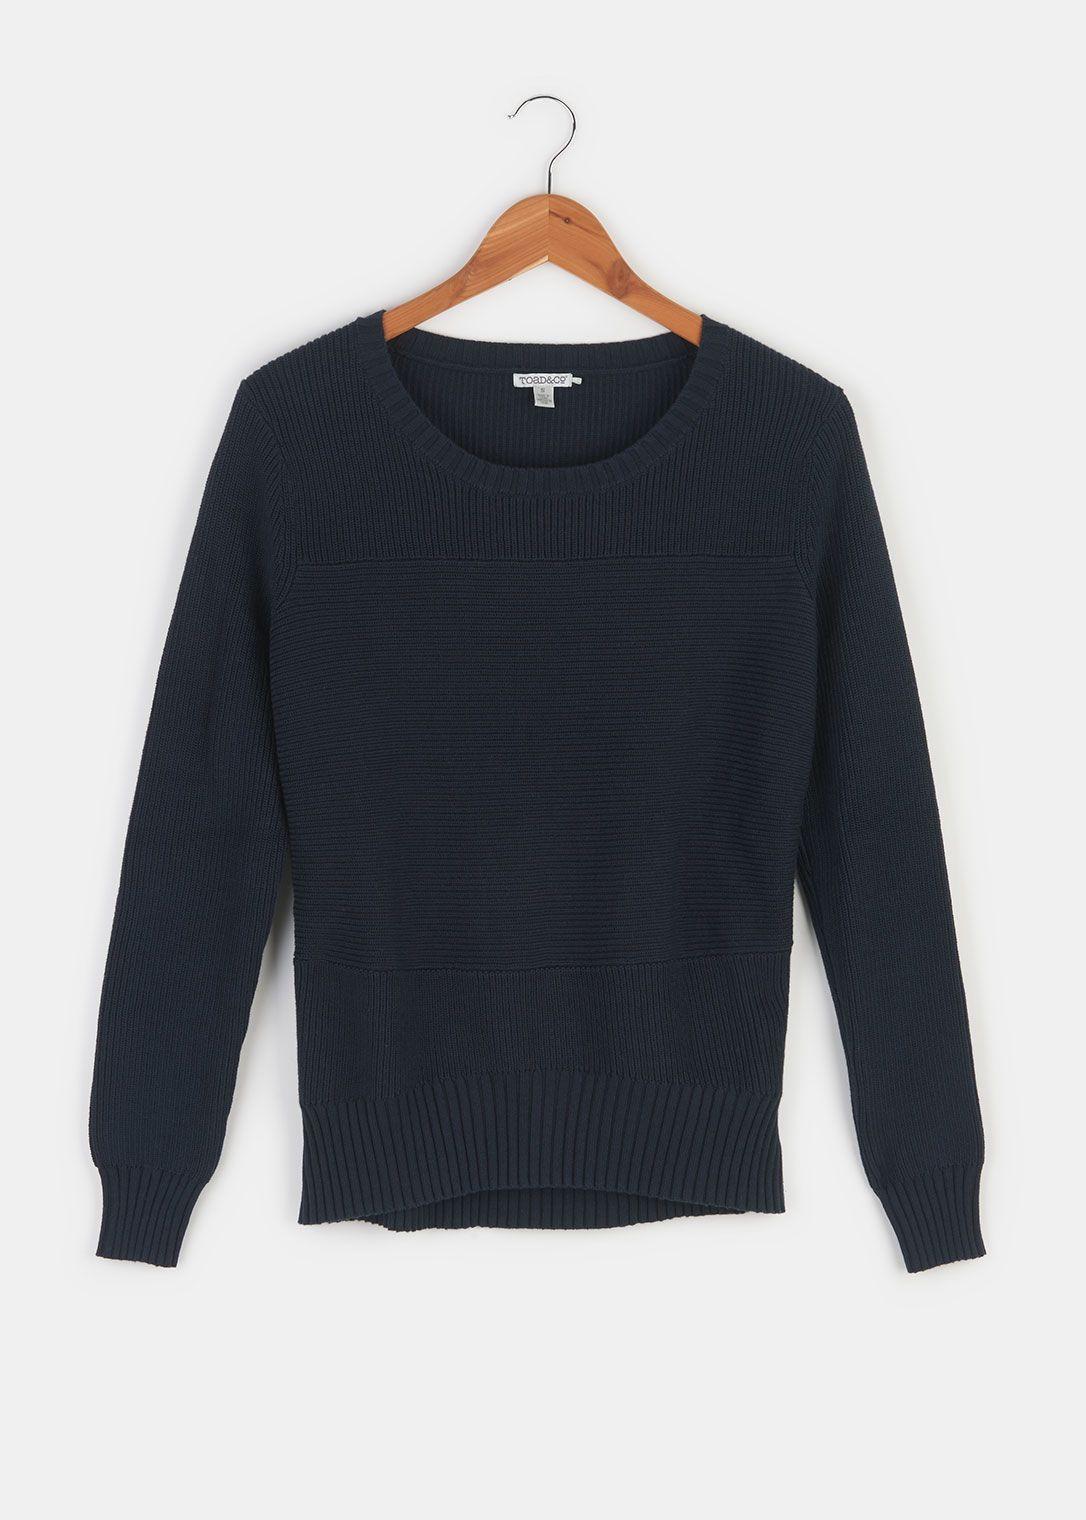 Organic Cotton Hearthstone Sweater | Rodale's | Fall Fashion ...